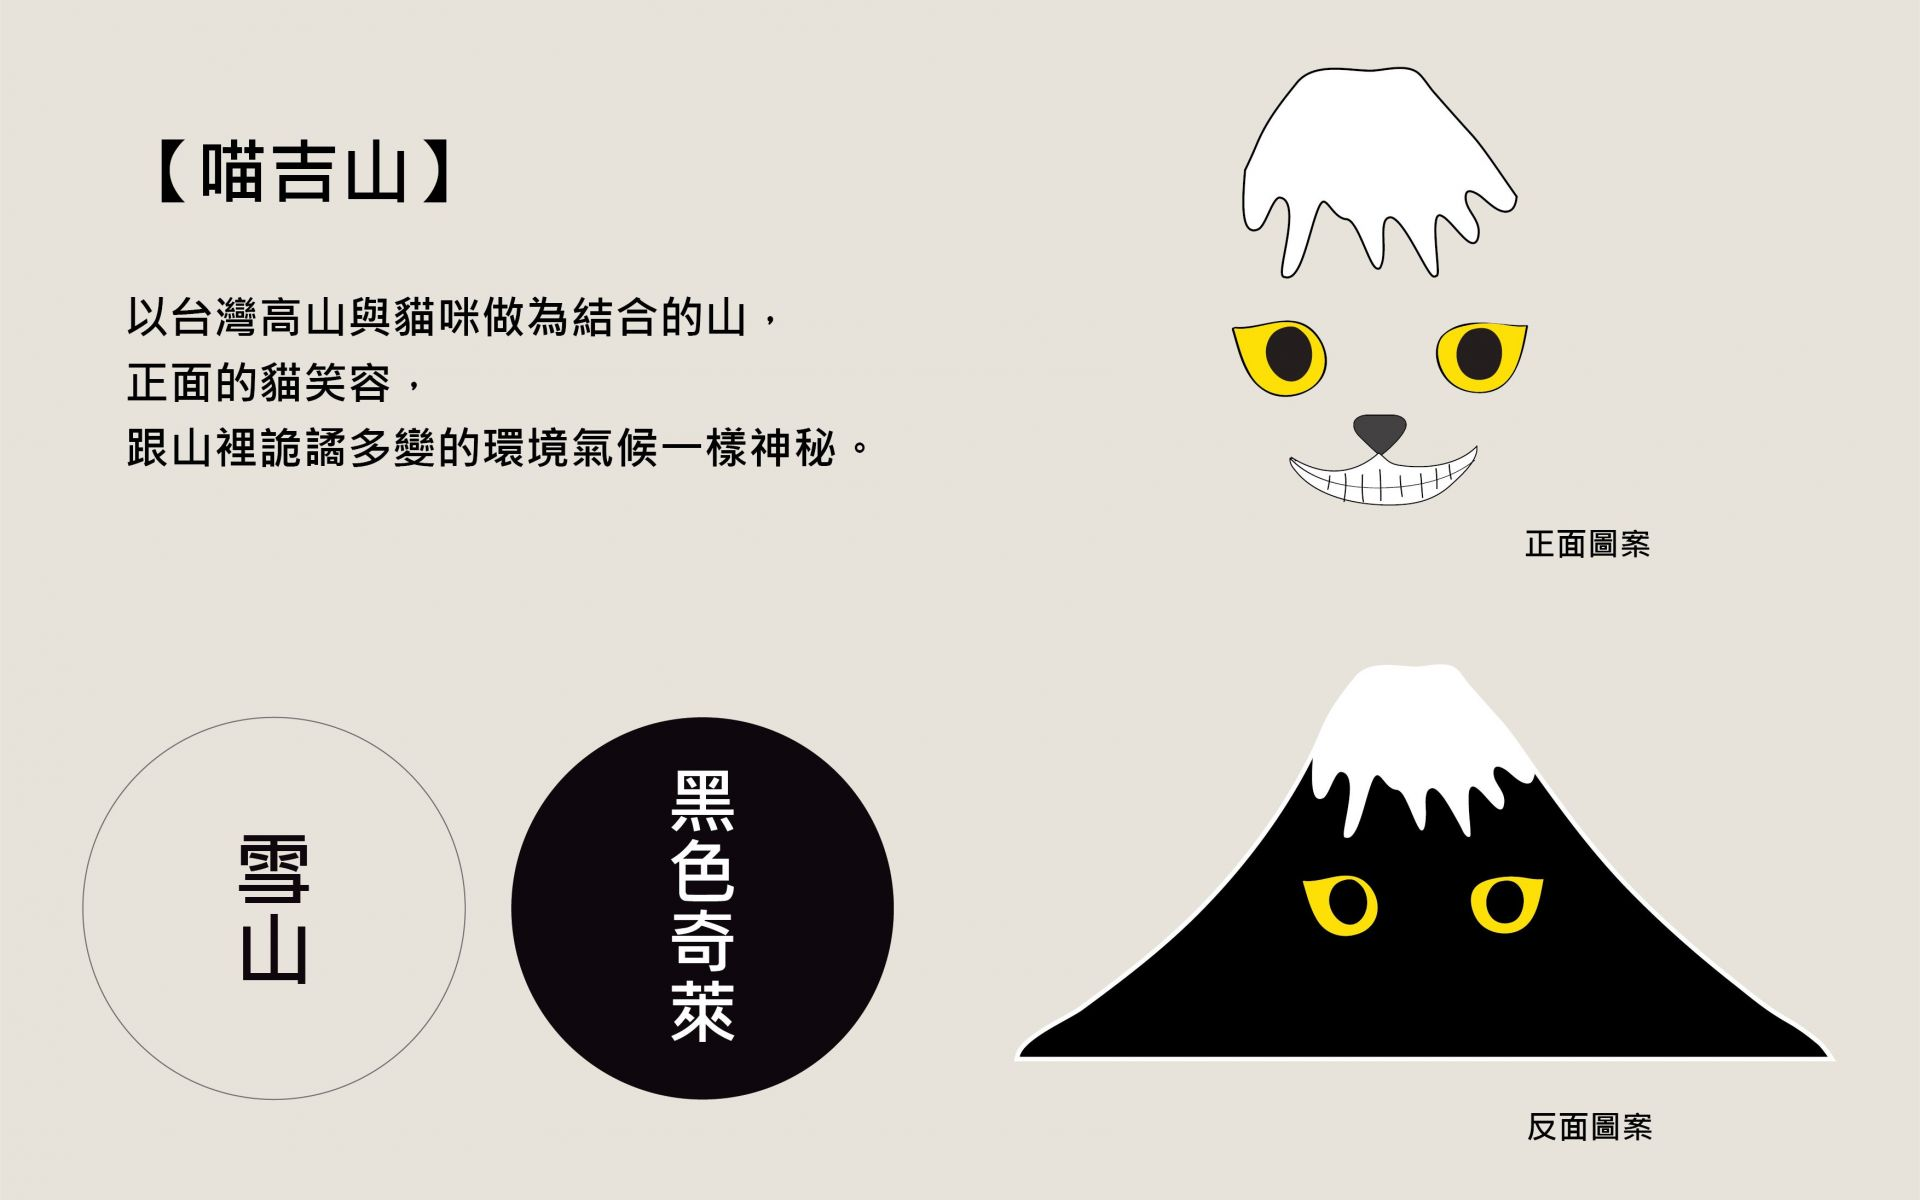 [Wildland] 中性款 WildlandX 看山 小貓聯名T/莫蘭迪藍 (M1662-141)